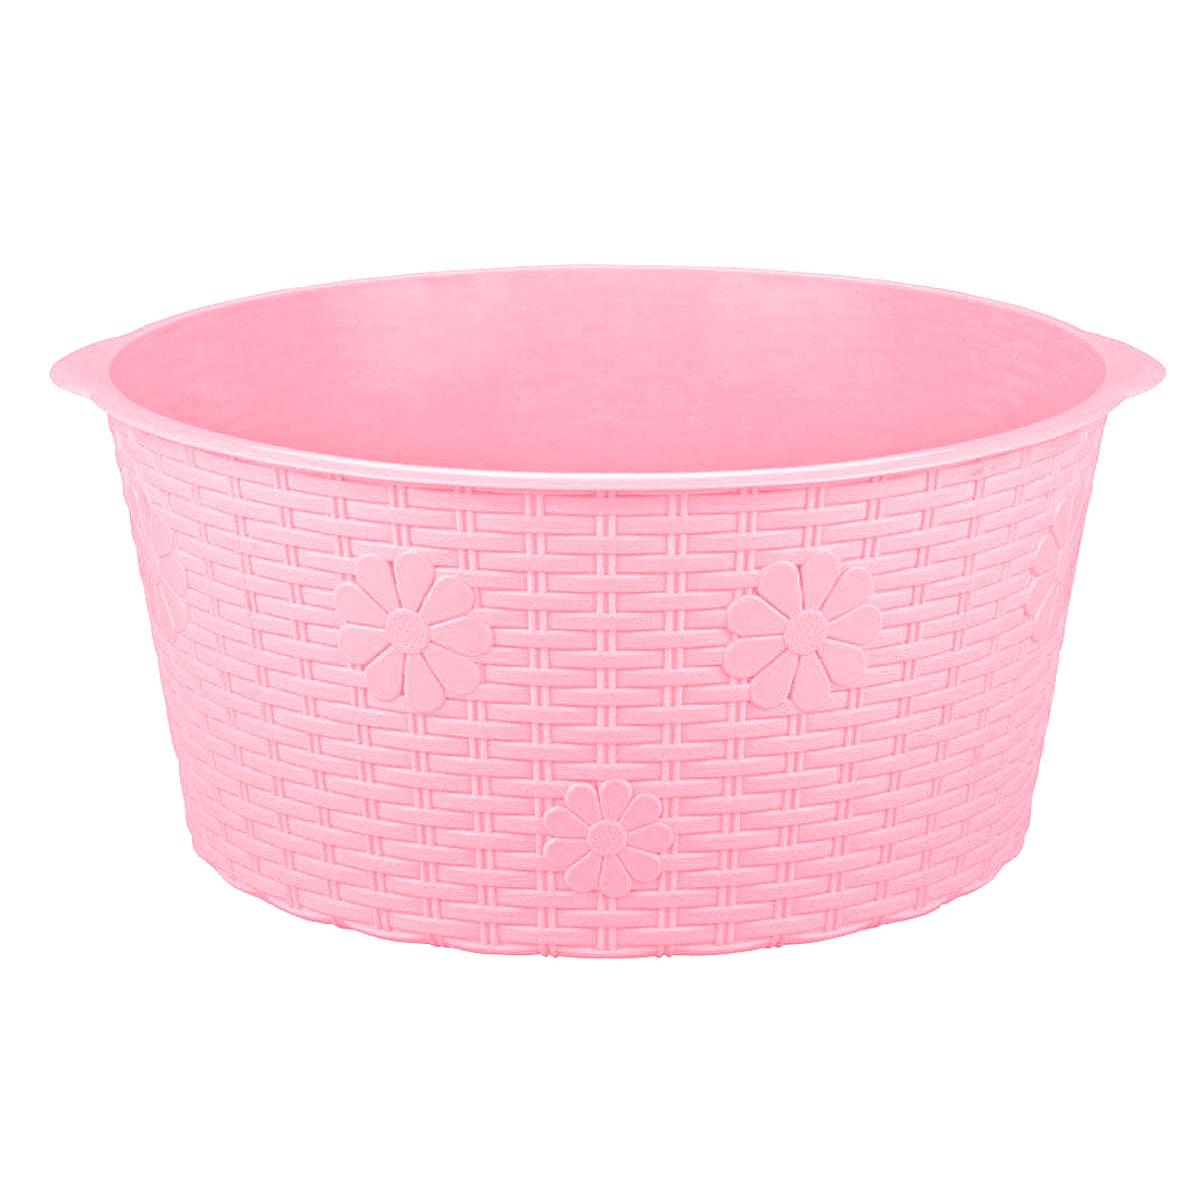 Таз Альтернатива Плетенка, цвет: розовый, 20 л таз азалия объем 10 л цвет зеленый 952965